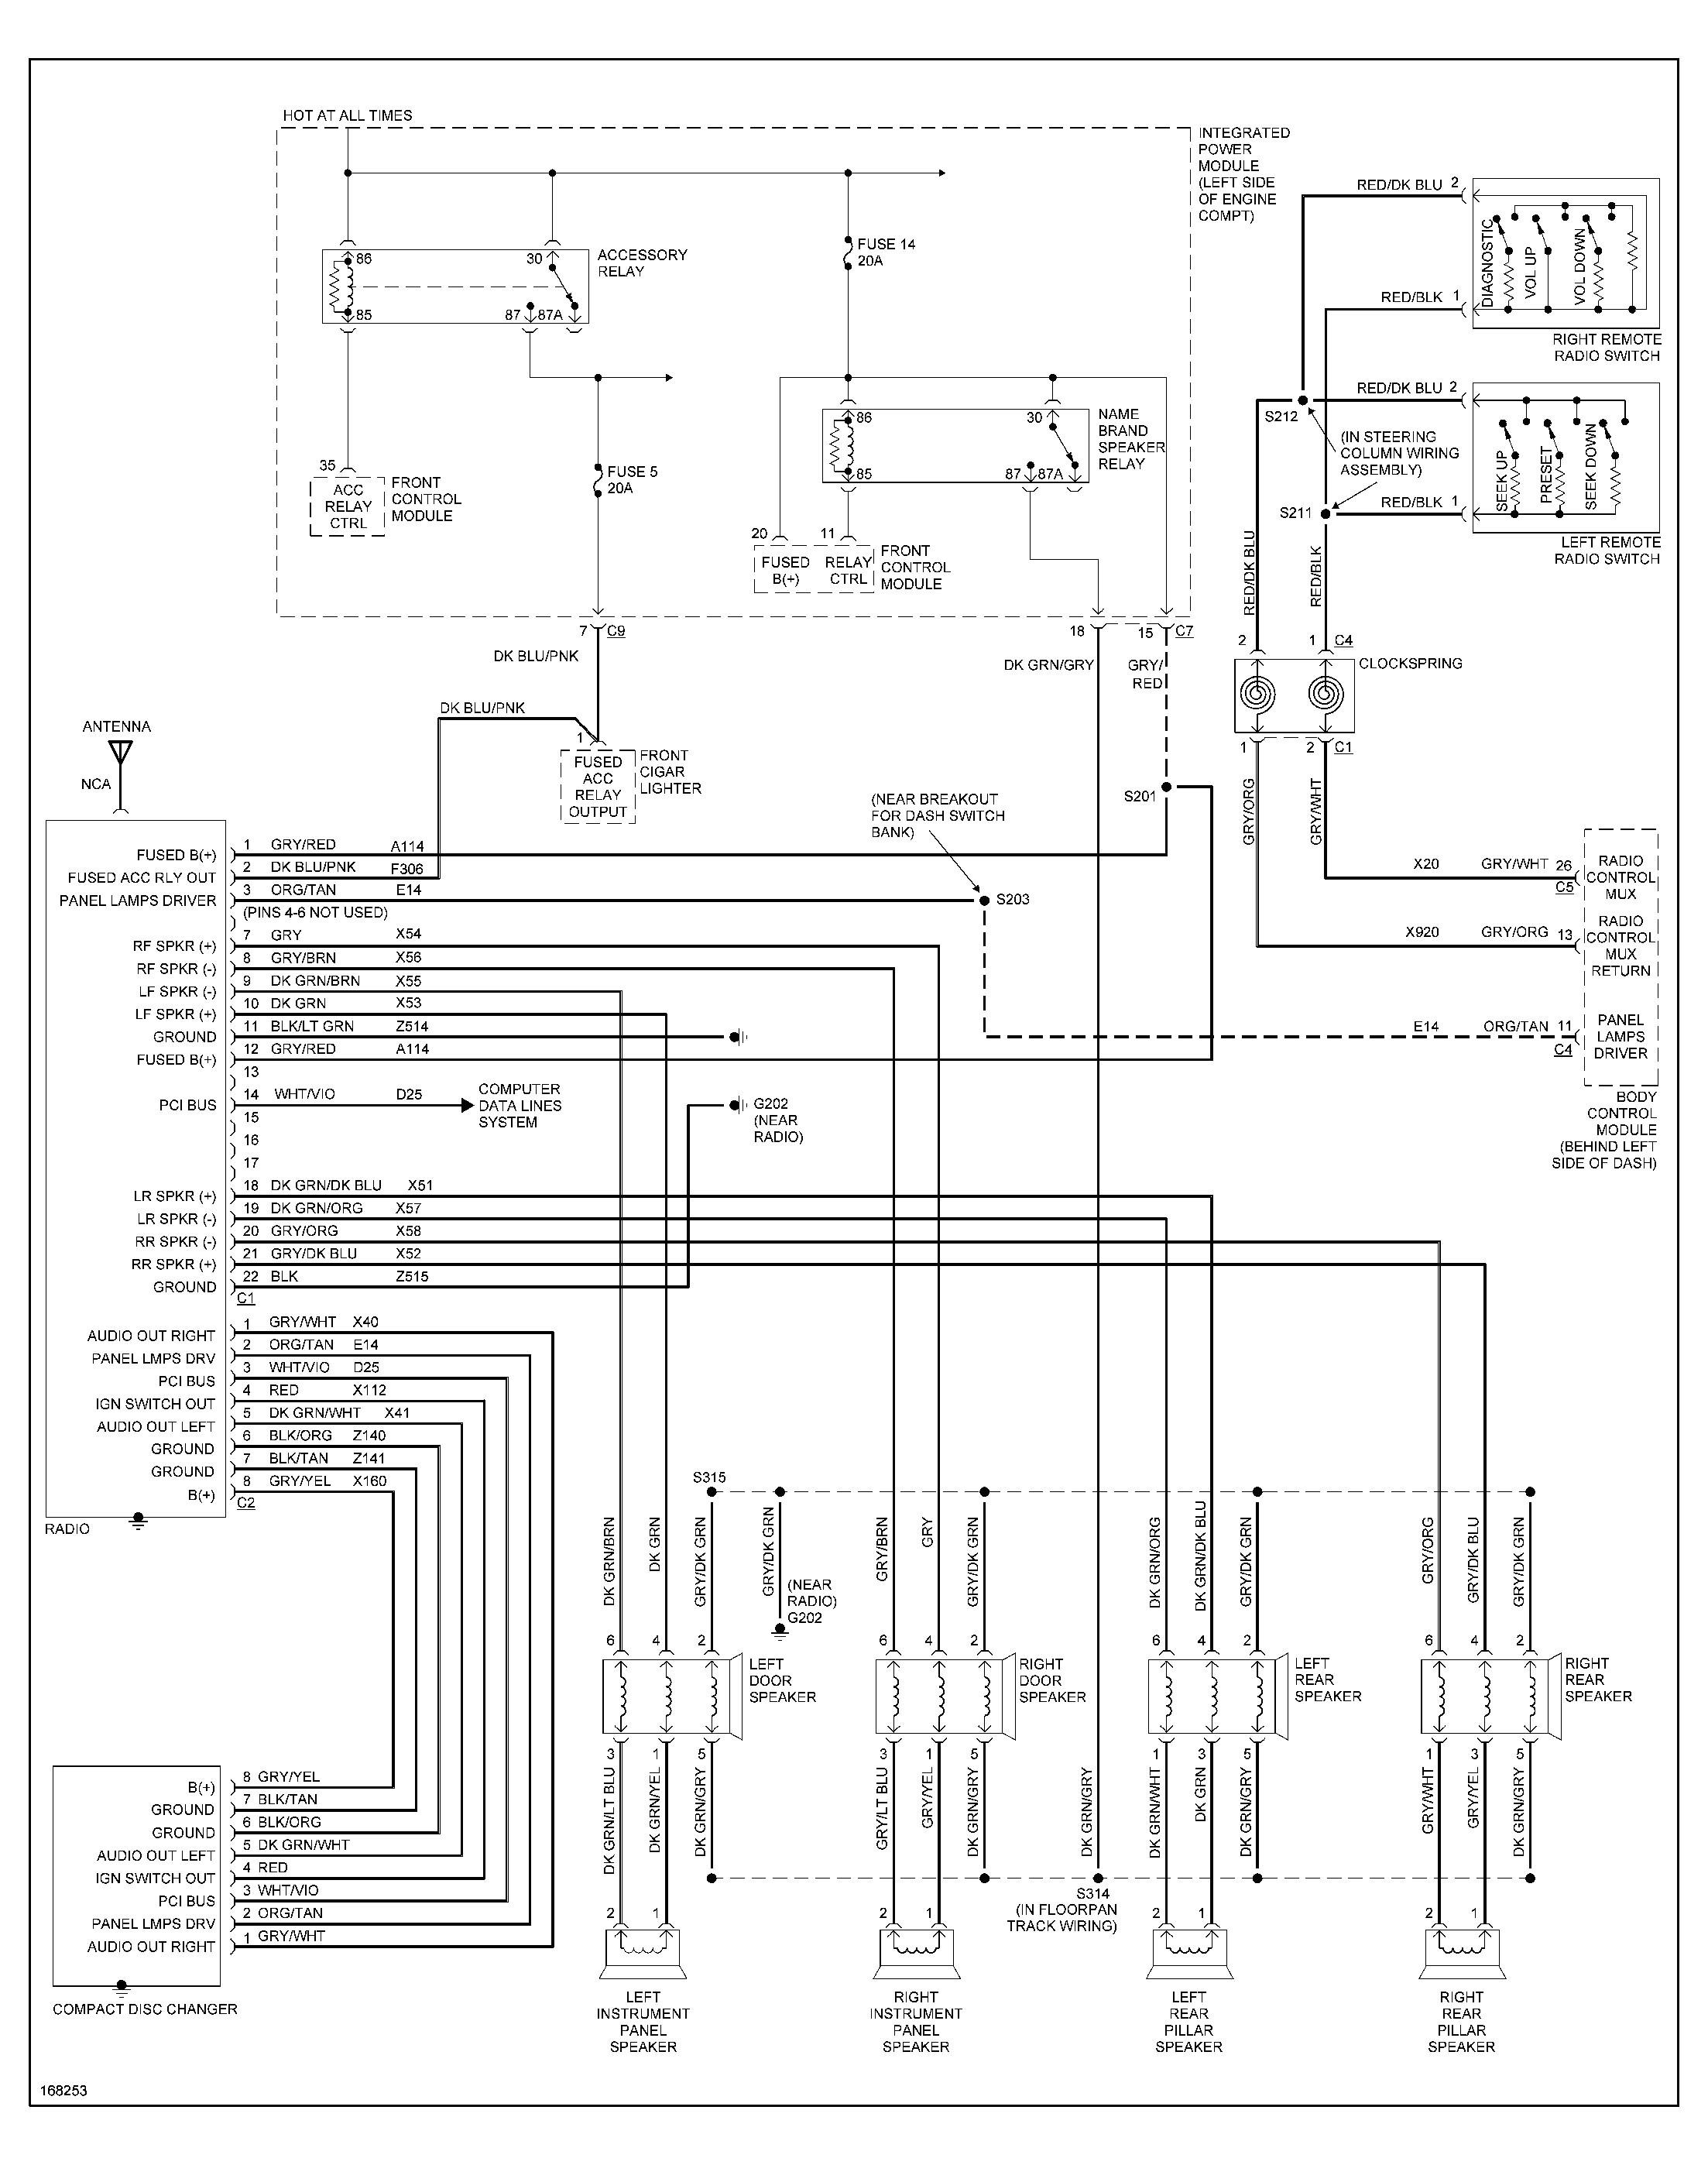 2008 dodge caravan wiring diagram wiring diagram database 1994 dodge caravan wiring diagram